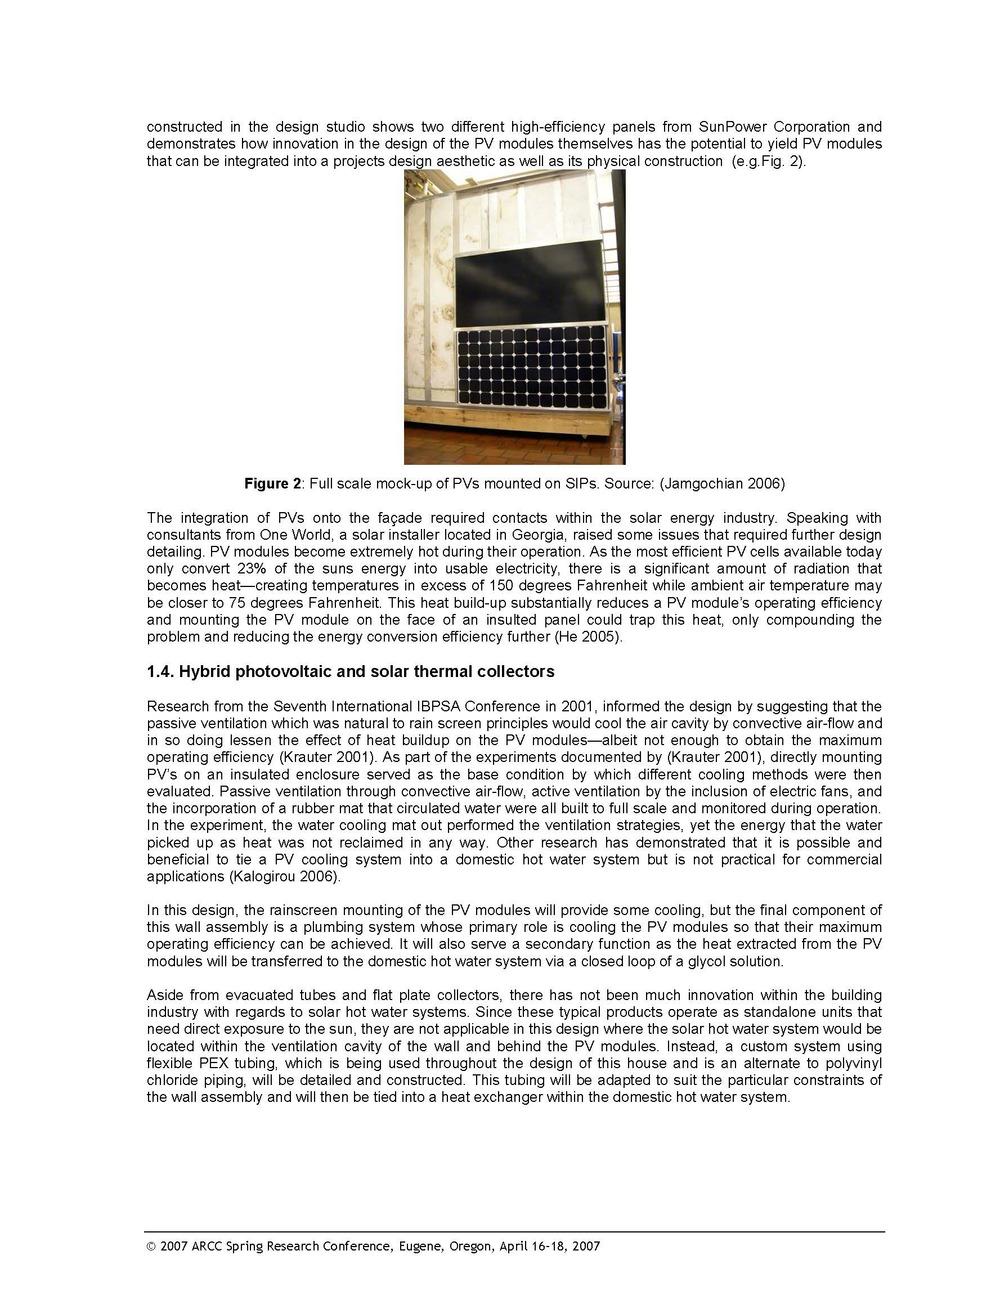 075_Page_5.jpg